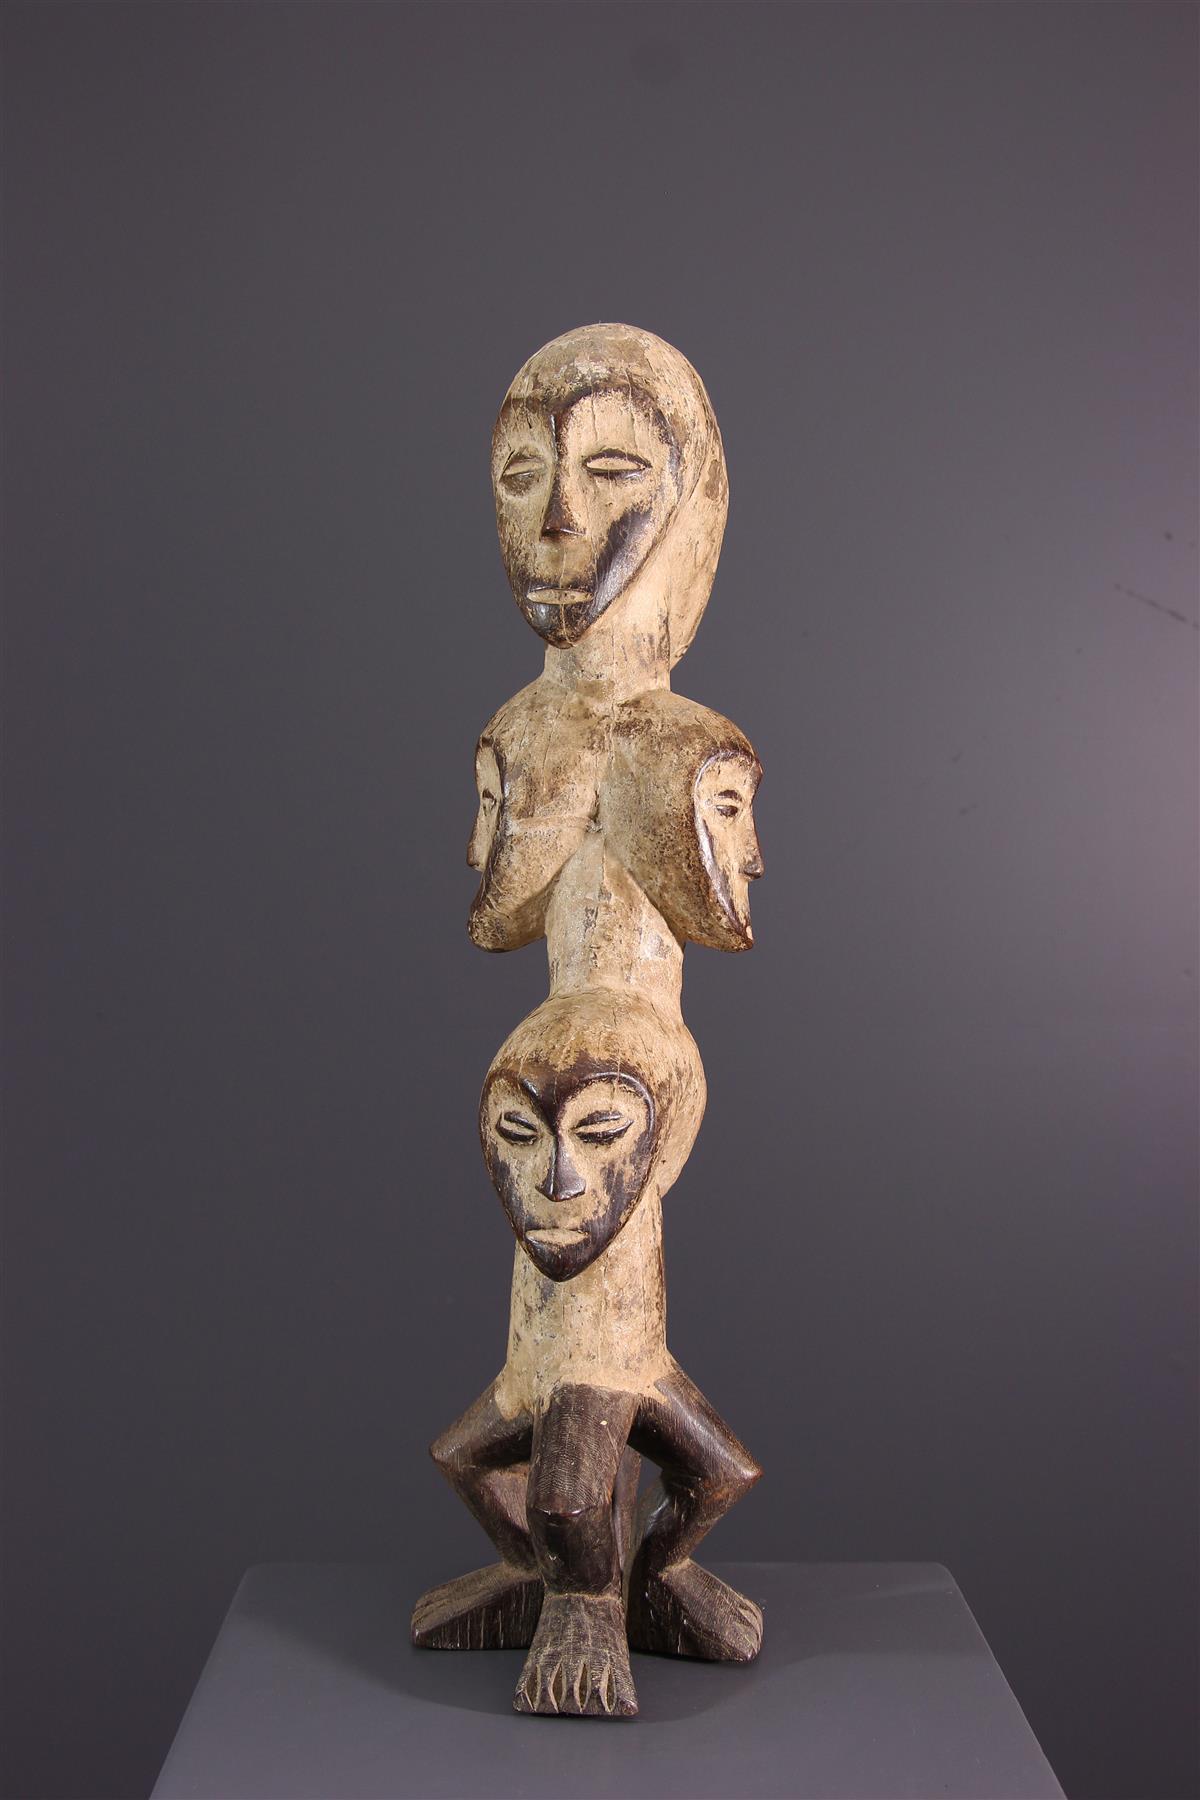 Lega statue - African art